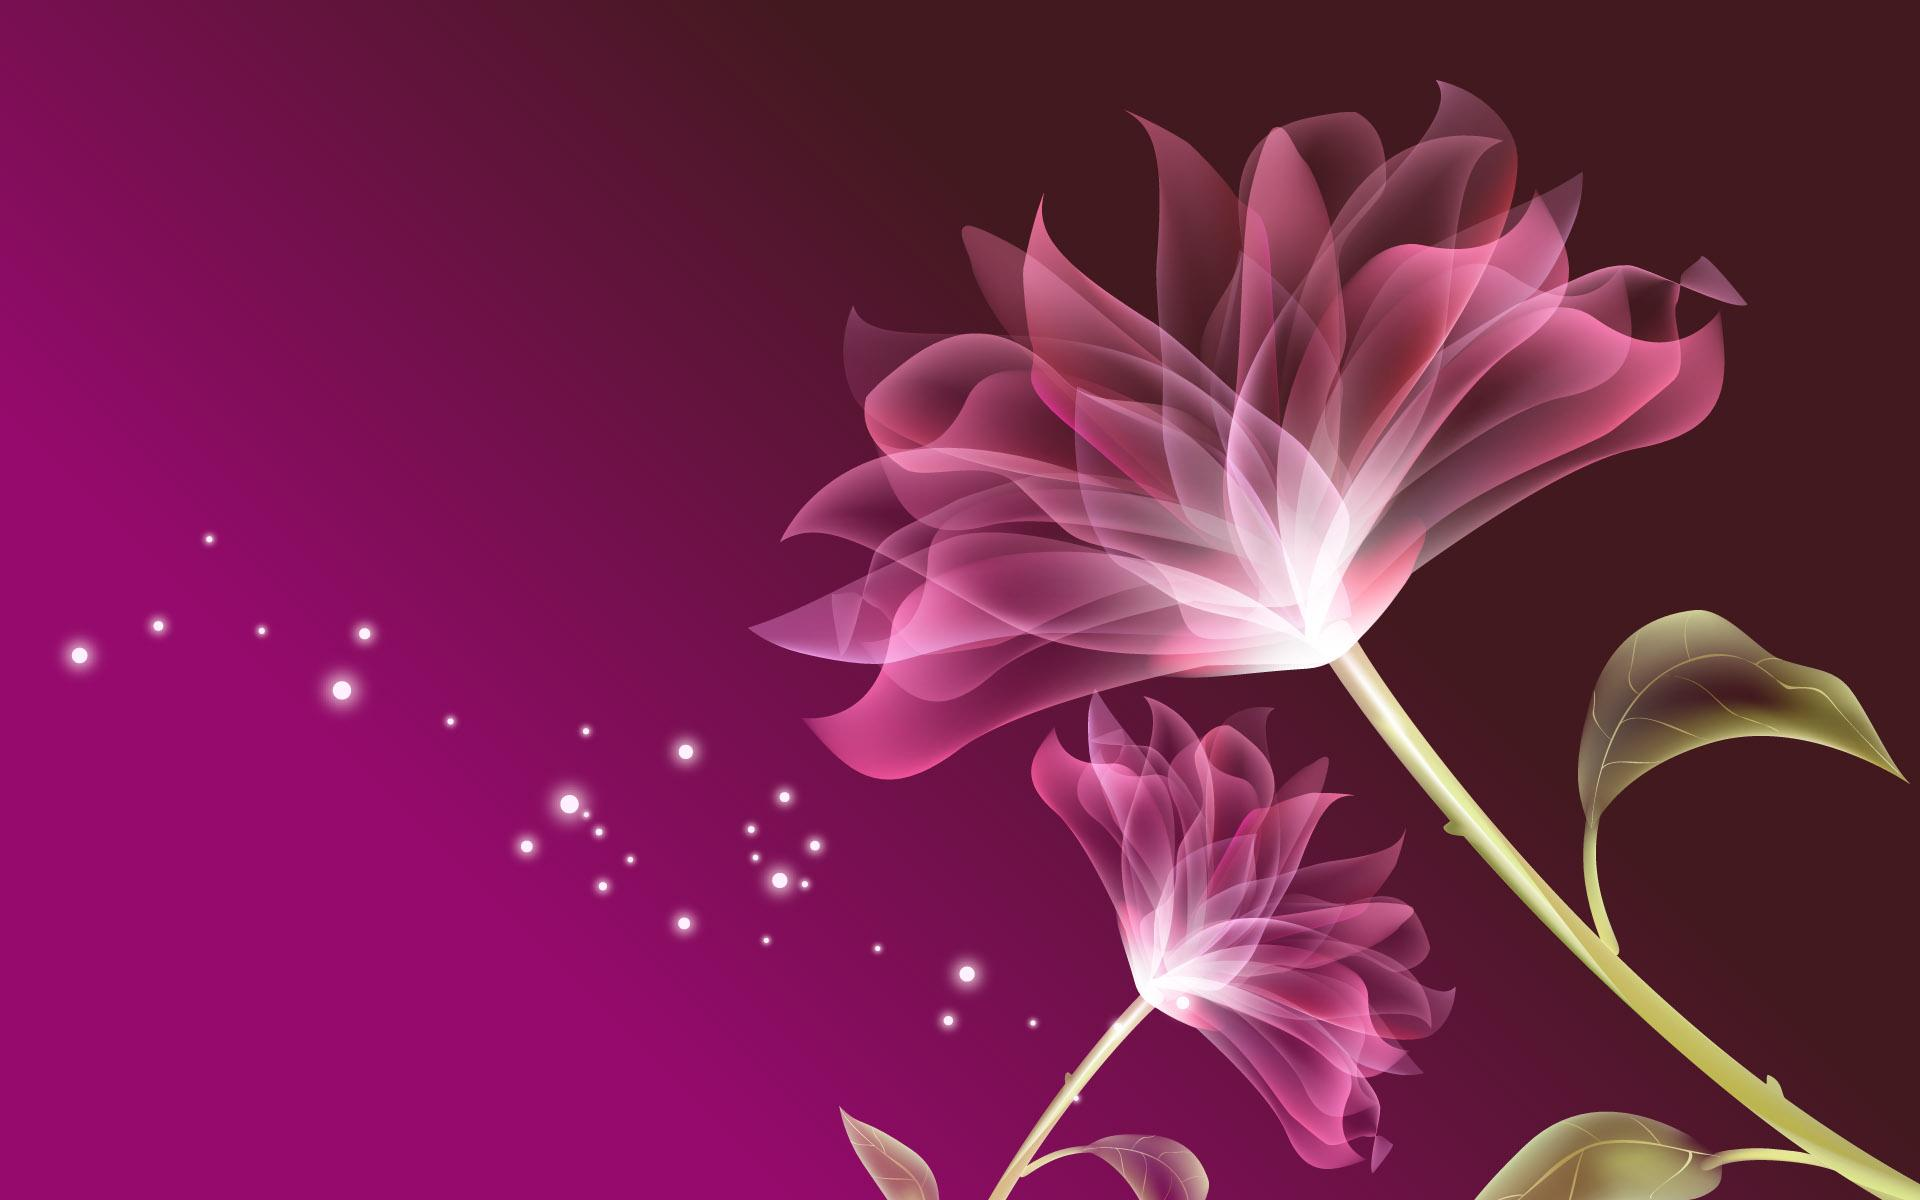 Floral Wallpaper 064